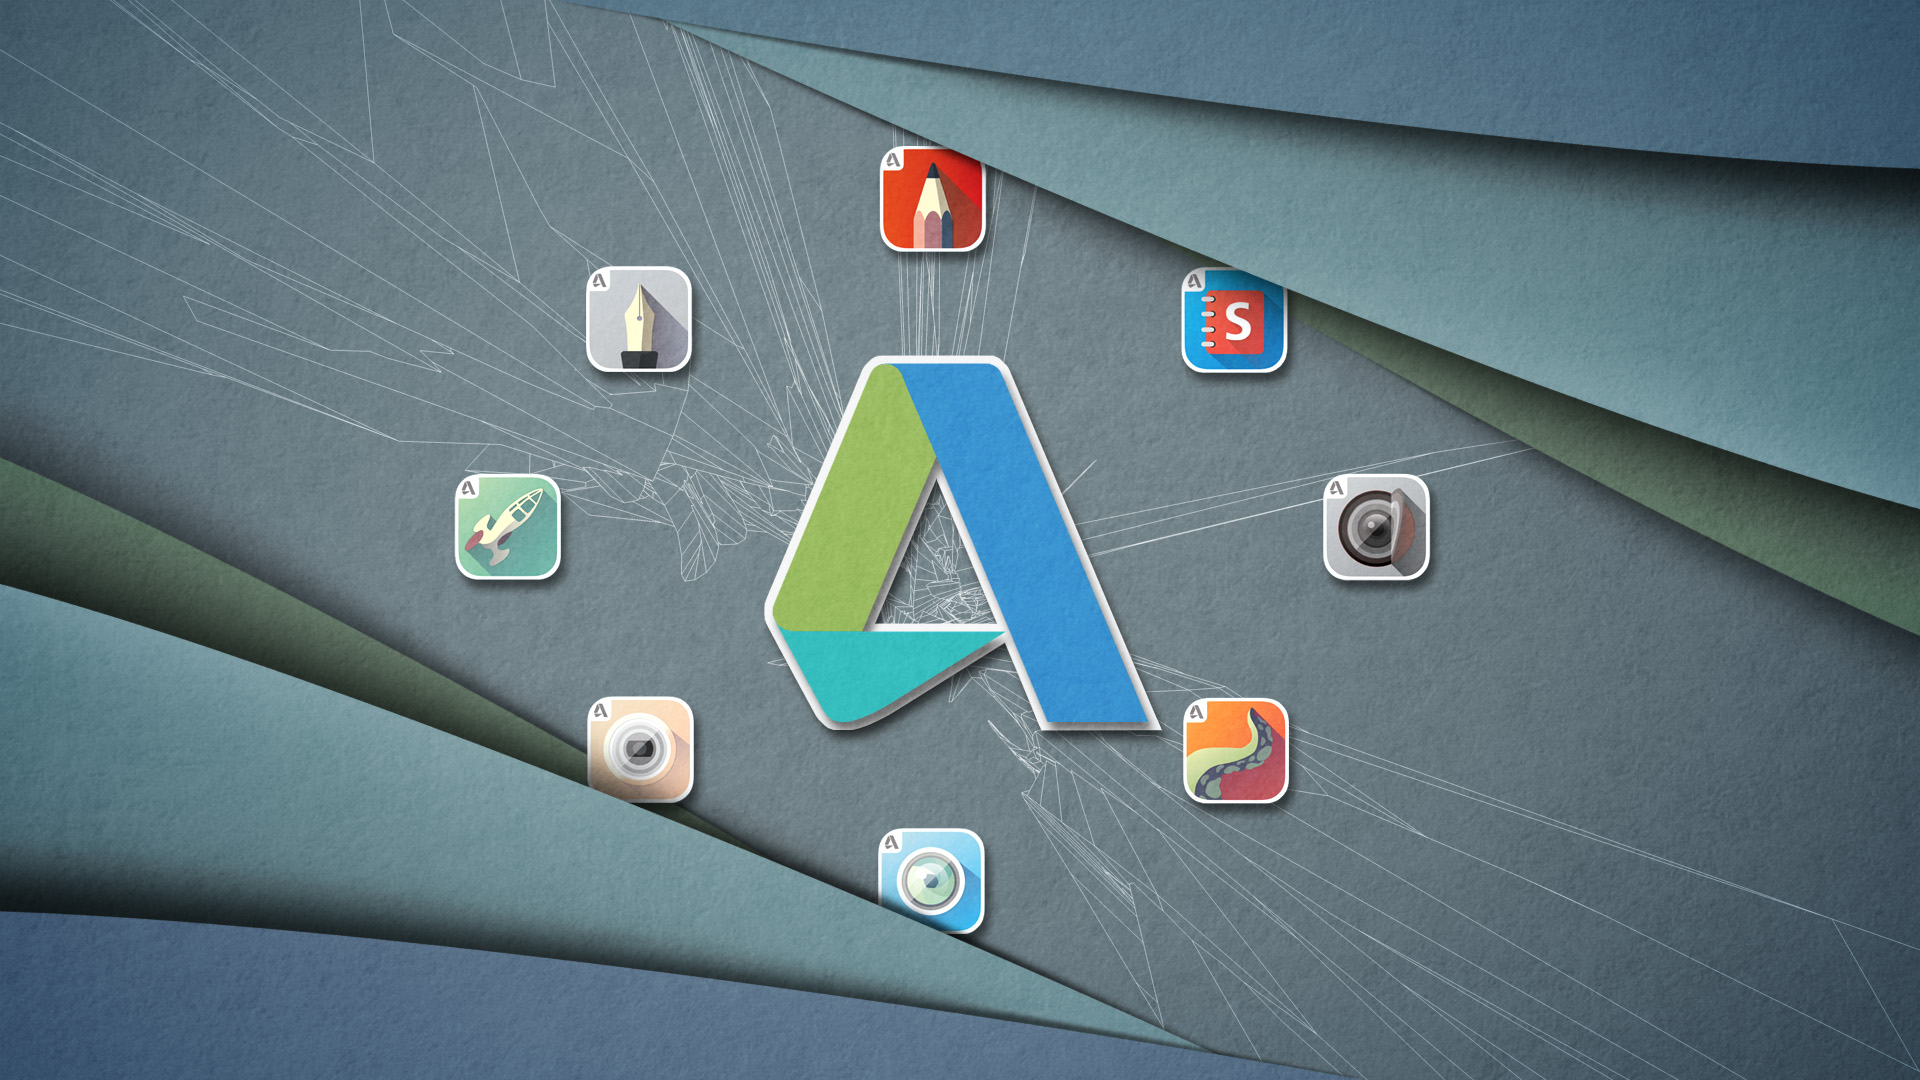 autodesk_consumer_group_image01